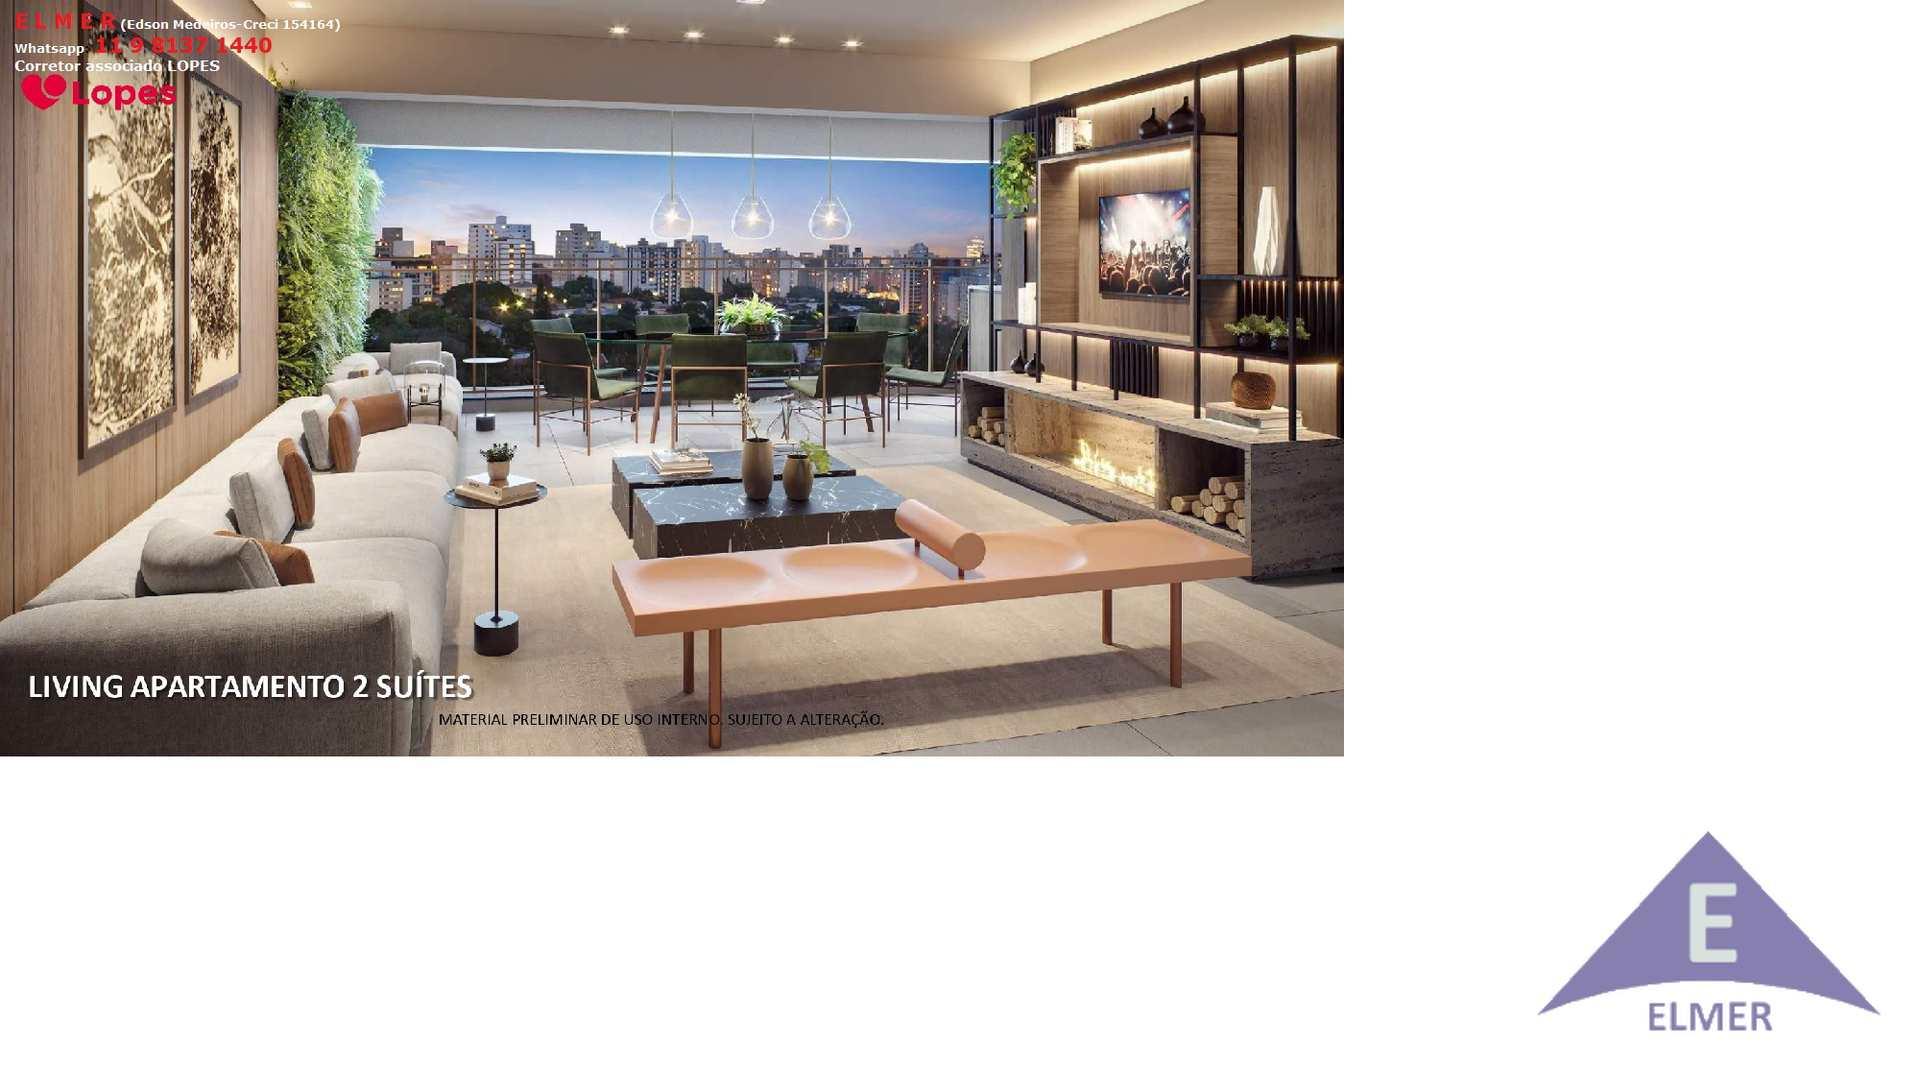 11 - Living 2 suites - Haus Mitre -Campo-Belo...